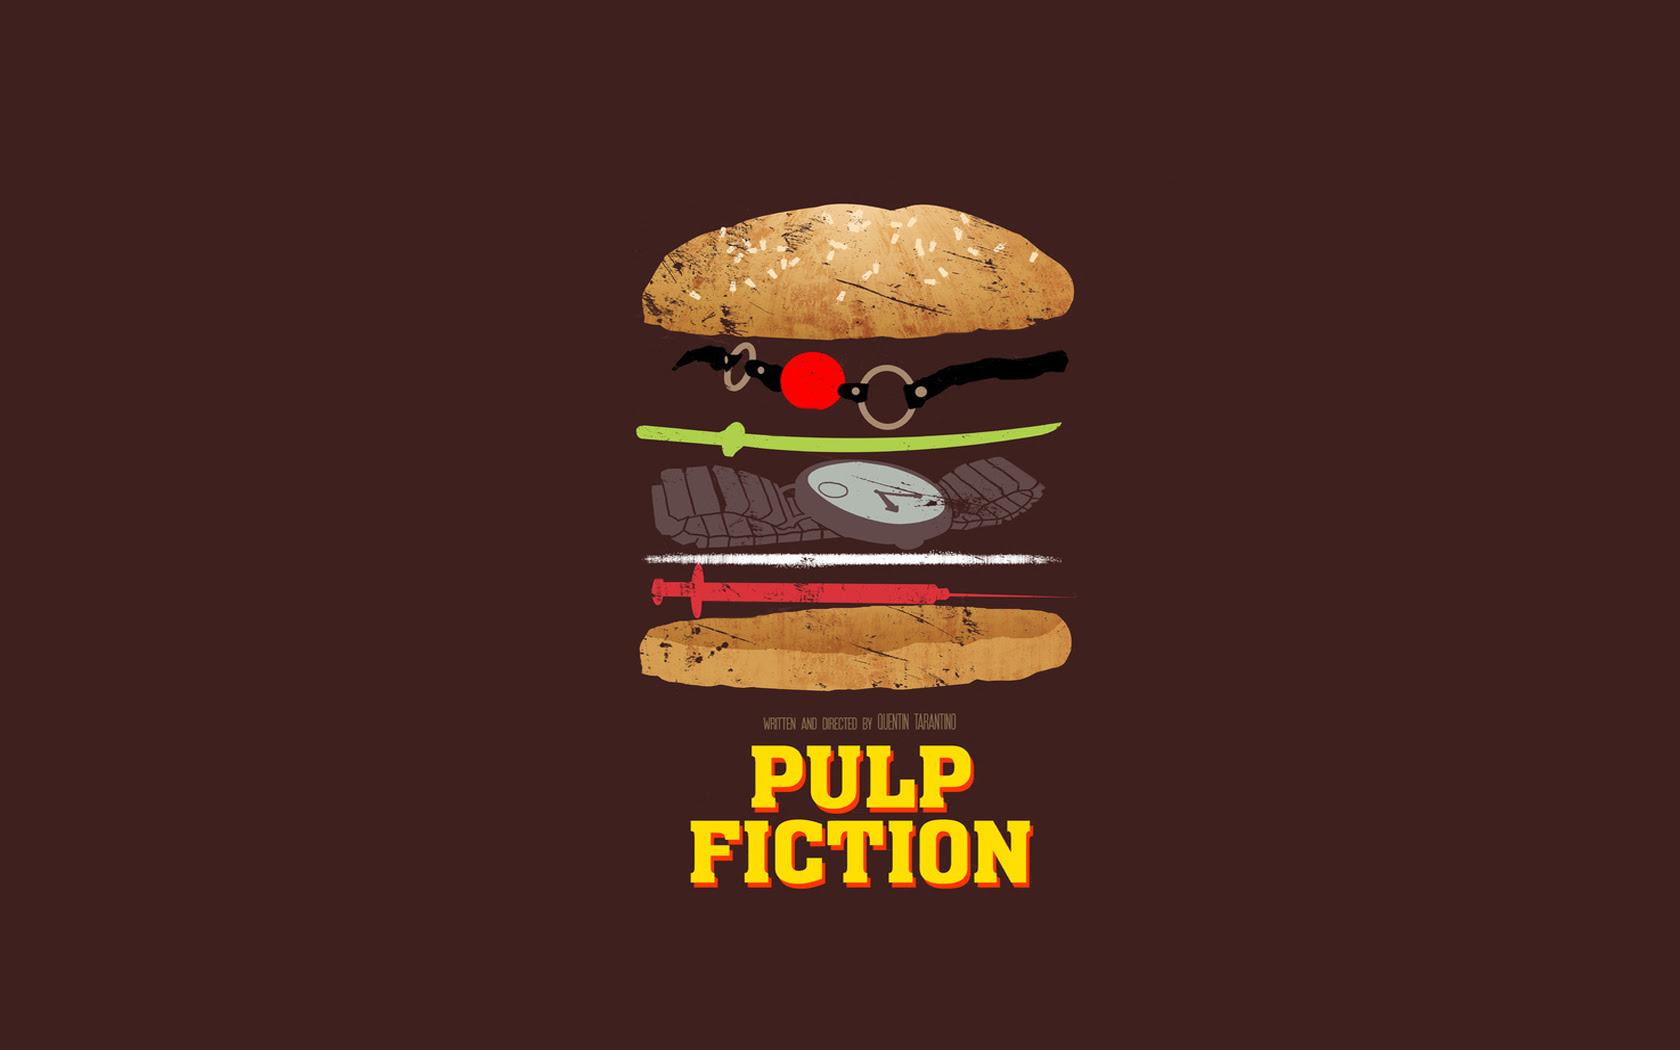 Download Star Wars Pulp Fiction Wallpaper Gallery 1680x1050